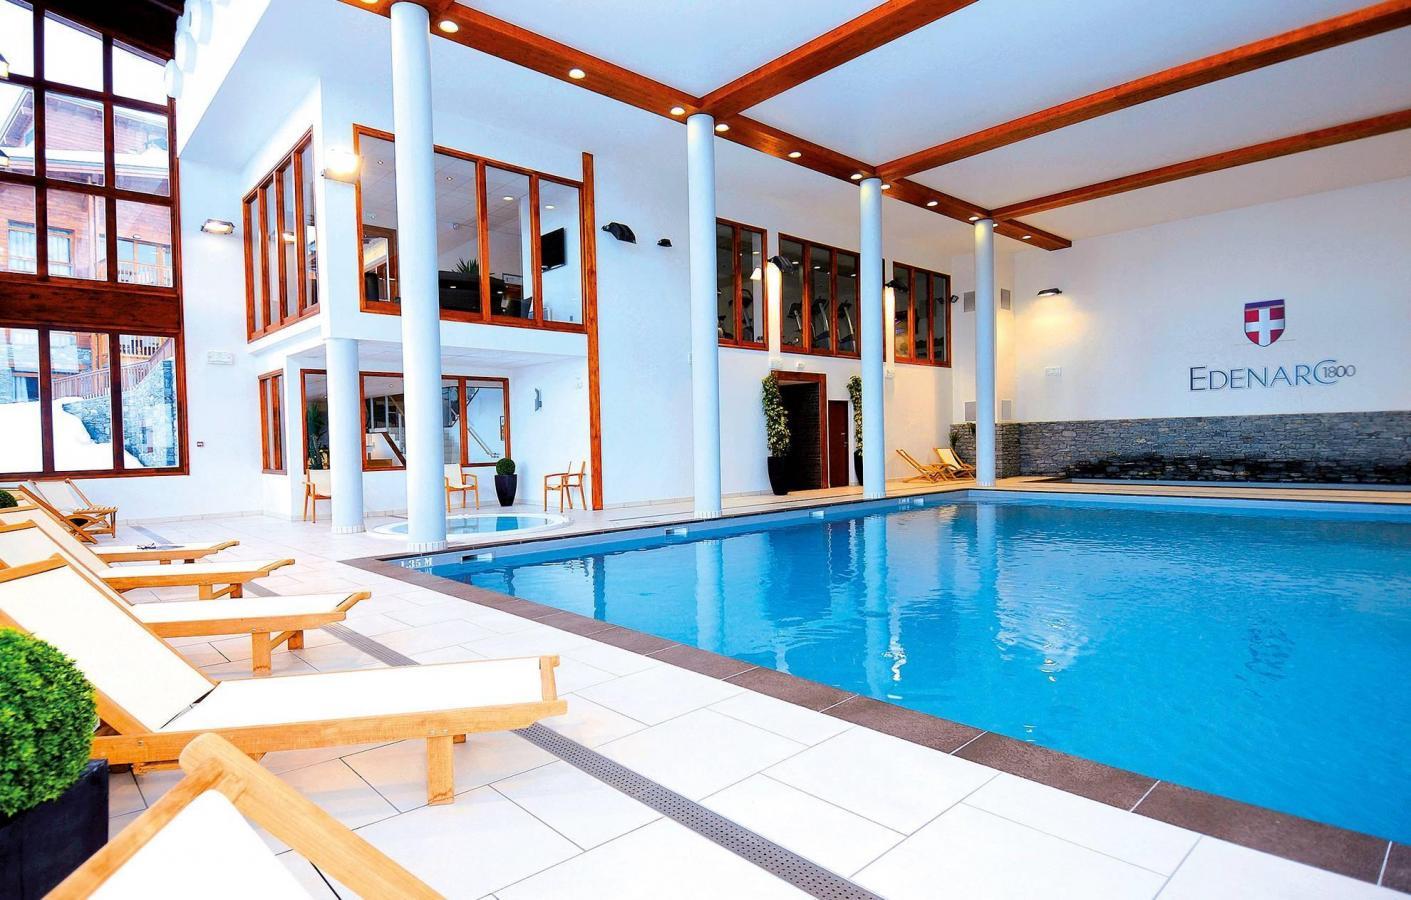 R sidence edenarc 20 les arcs location vacances ski for Residence piscine couverte